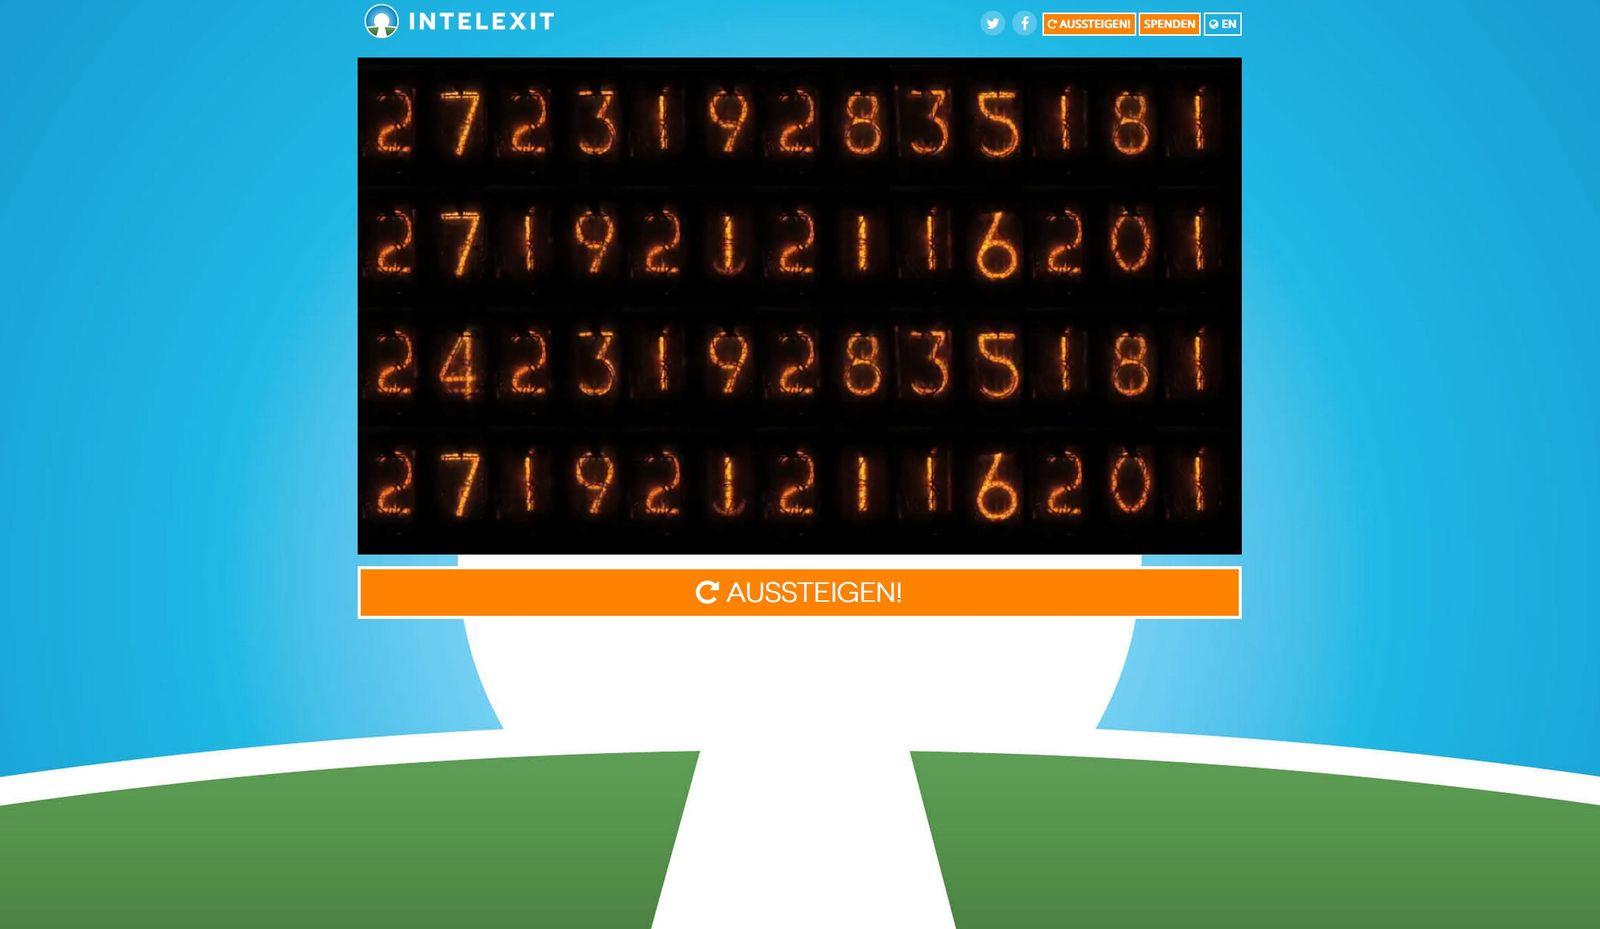 Screenshot/ intelexit